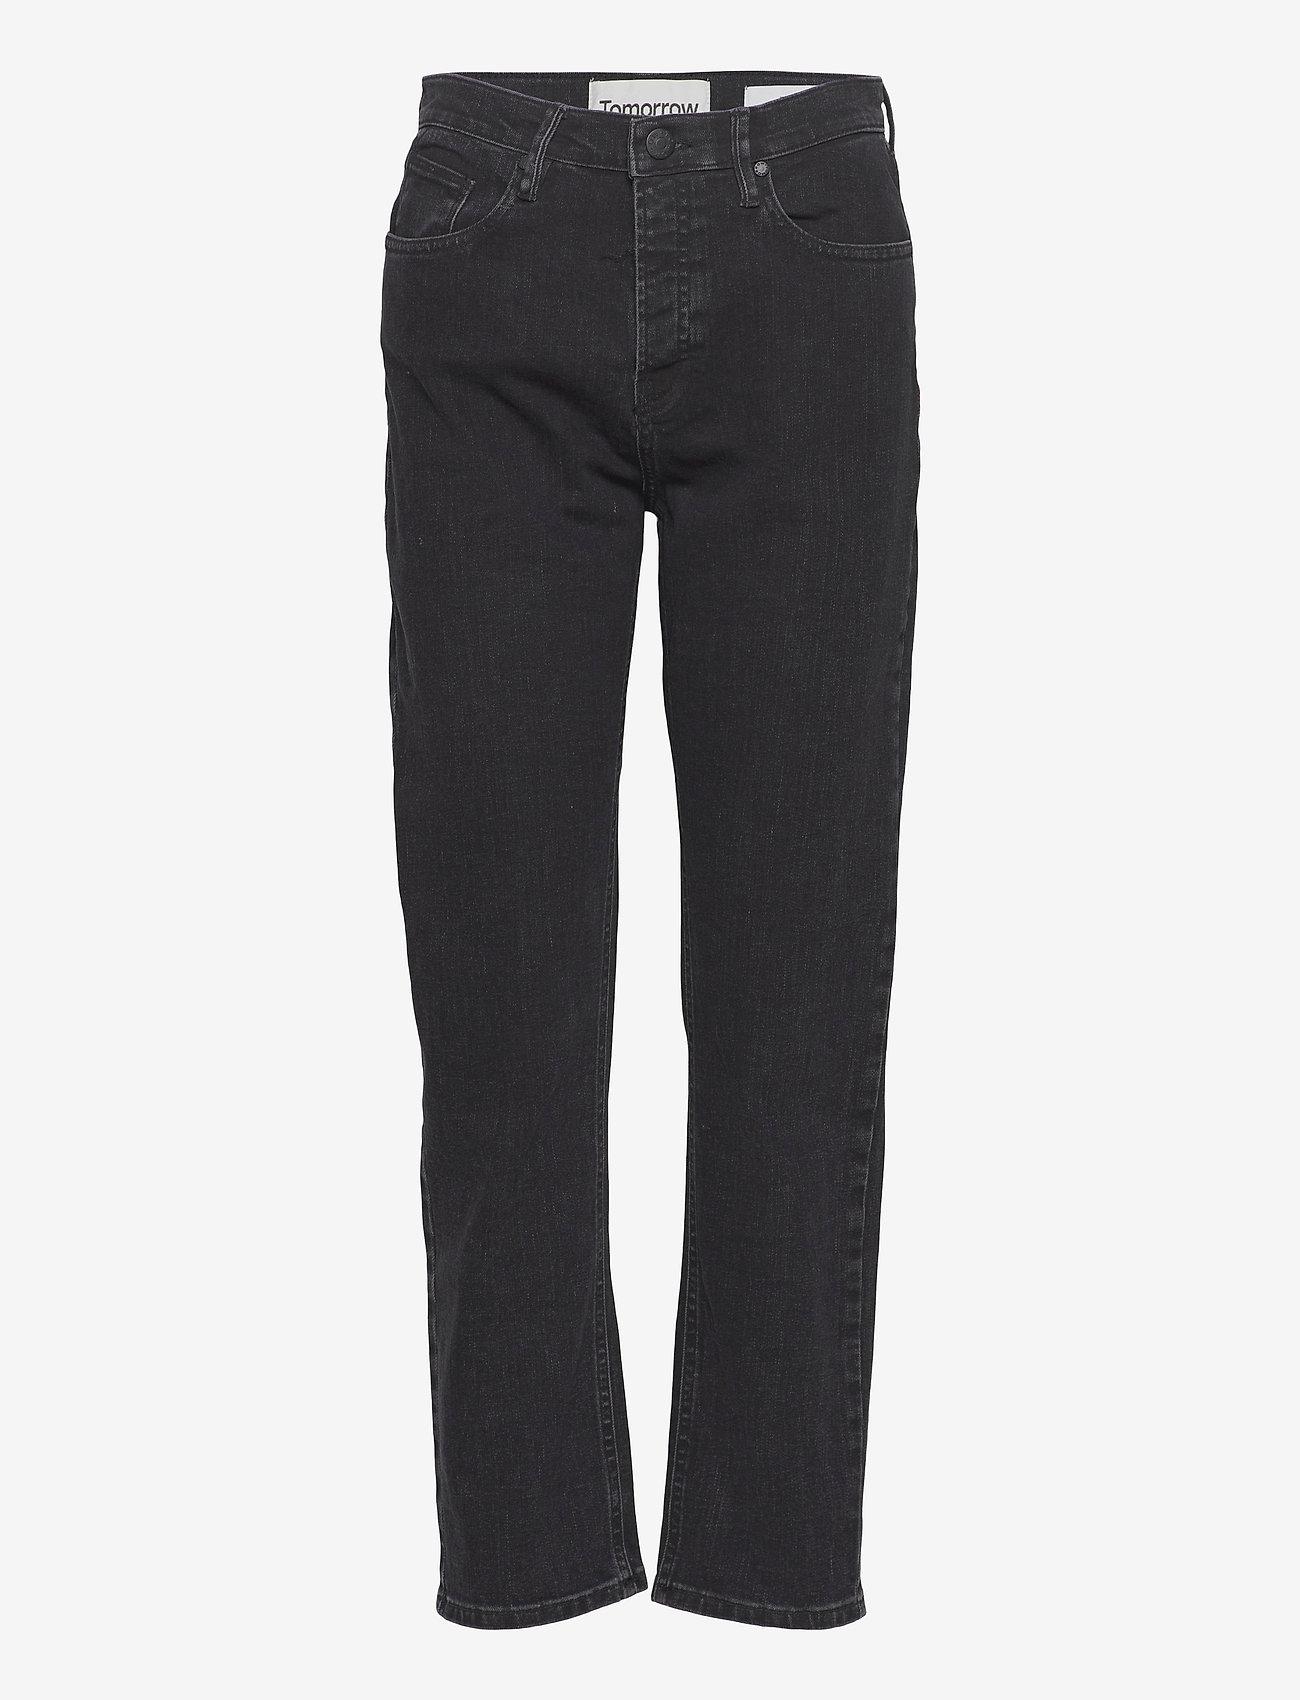 Tomorrow - Teresa regular jeans original black - straight regular - black - 0